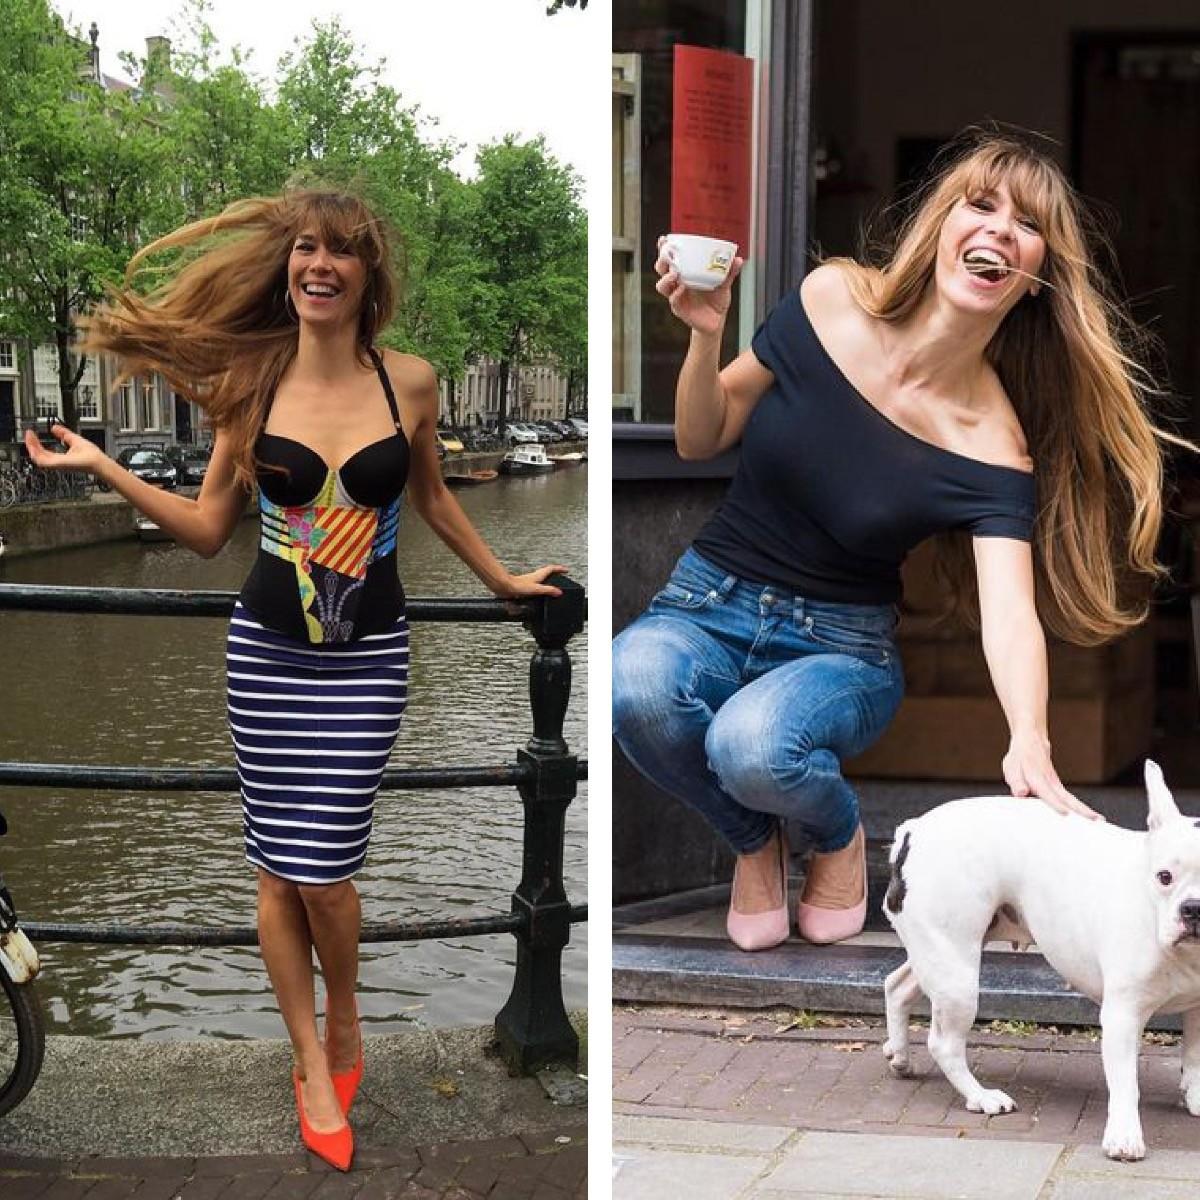 black mesh heels pumps stilettos suede summer shoes stand tall walk longer heel the world de rotterdam rem koolhaas canal erasmusbrug